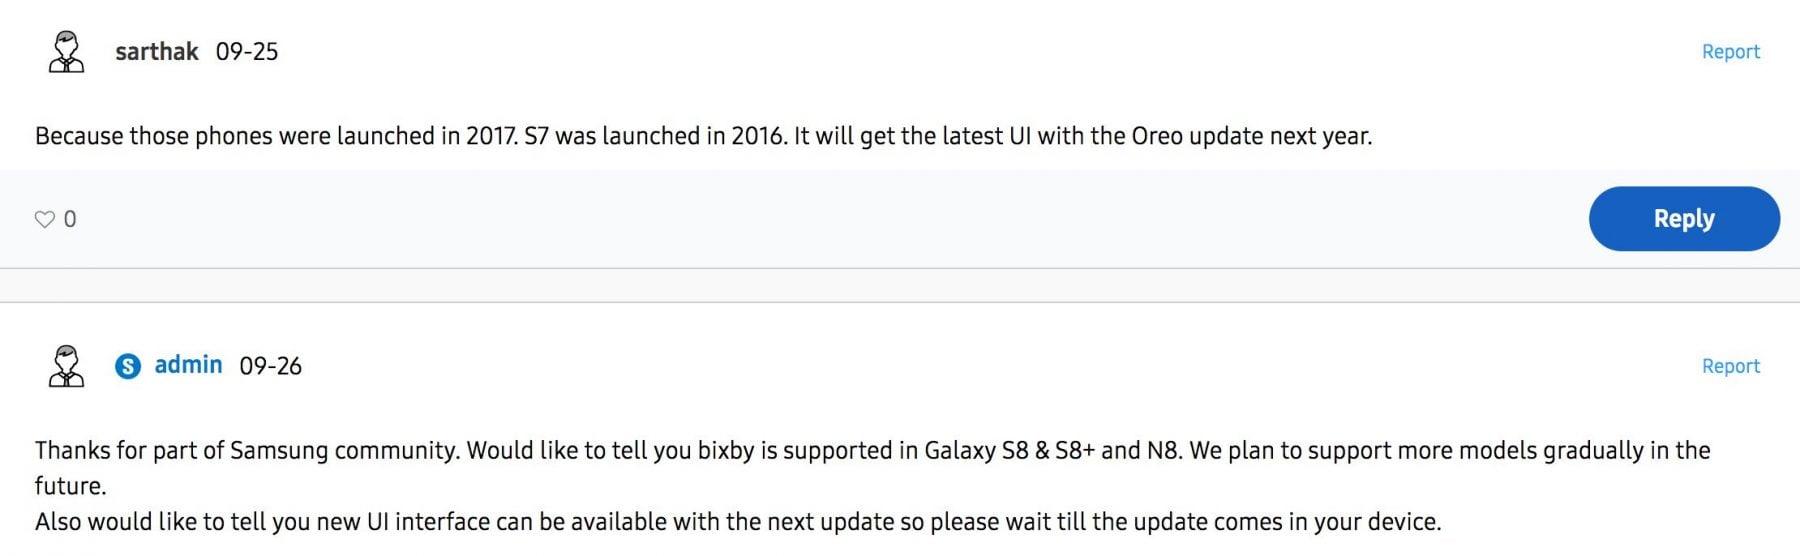 galaxy s7 oreo update